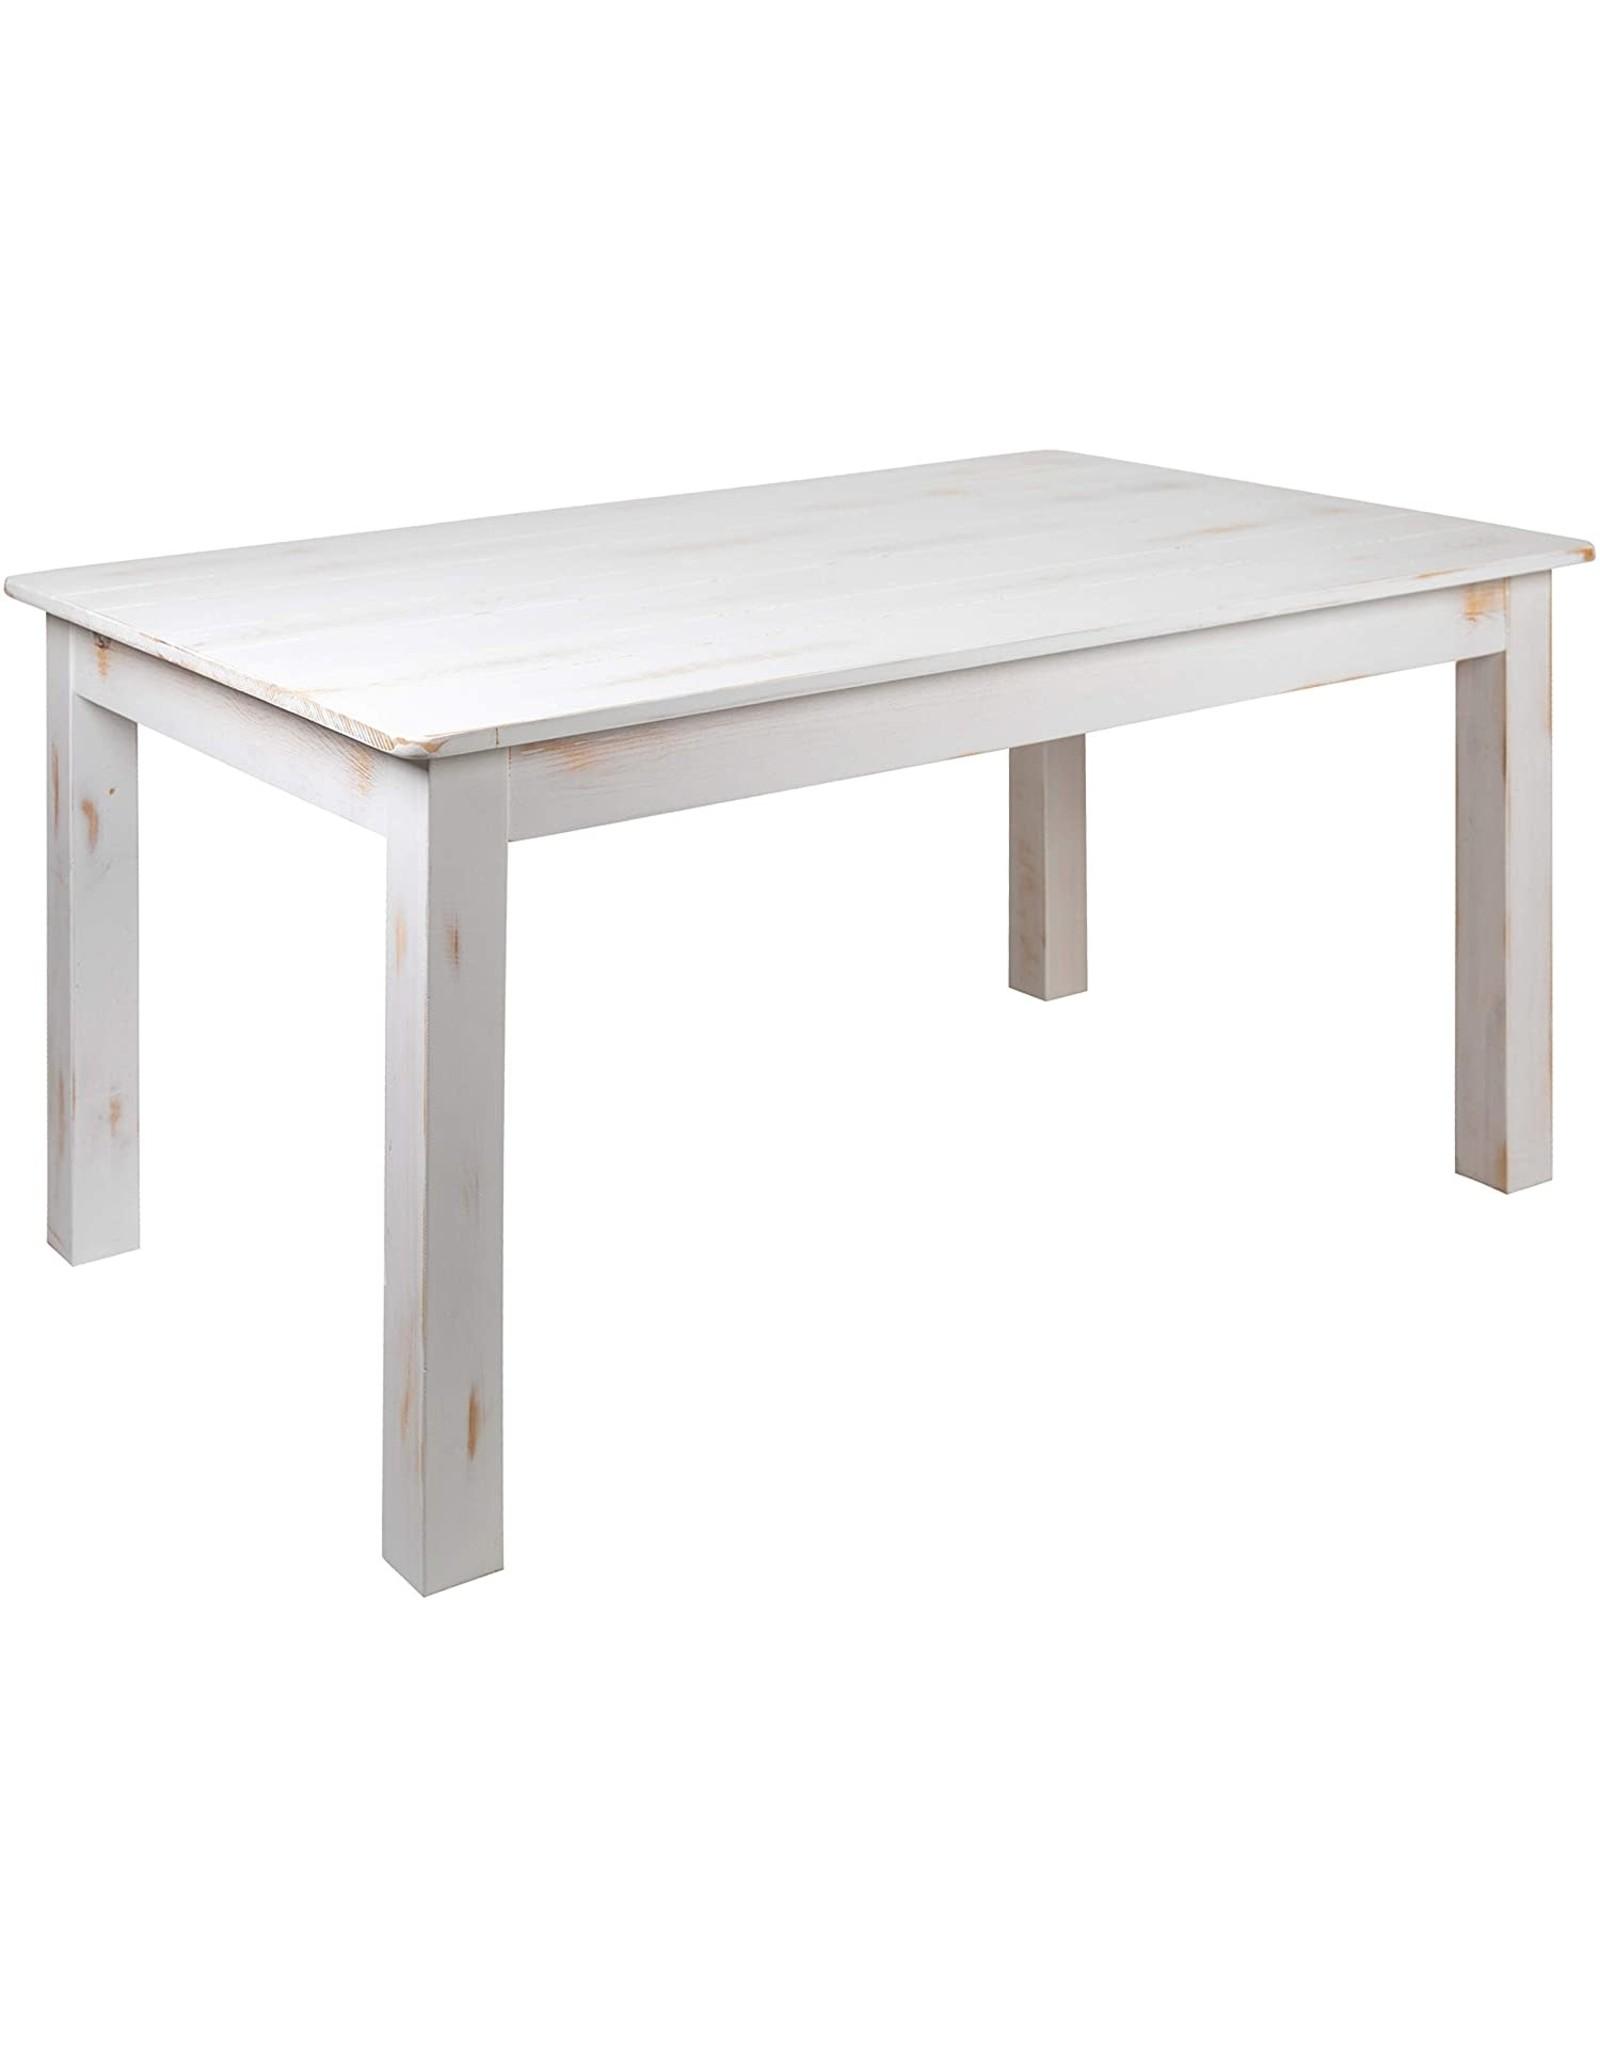 "Flash Furniture Flash Furniture HERCULES Series 60"" x 38"" Rectangular Antique Rustic White Solid Pine Farm Dining Table"